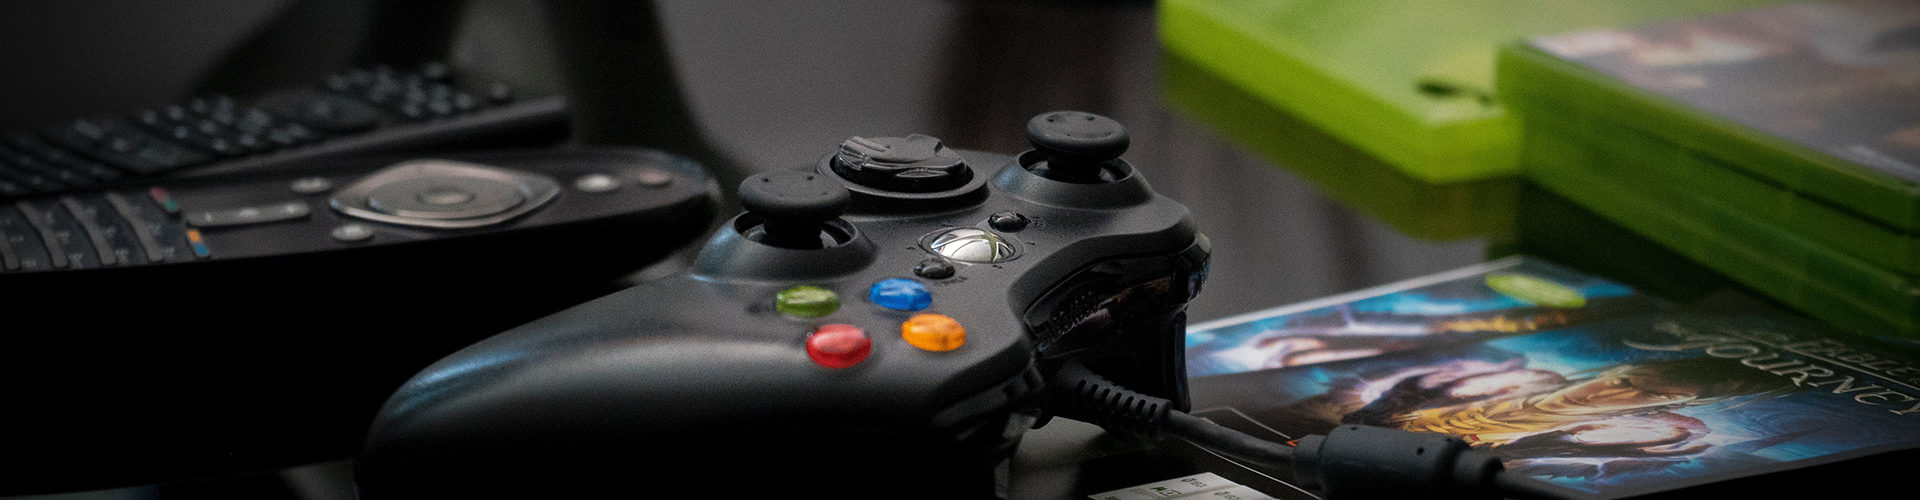 storing video games